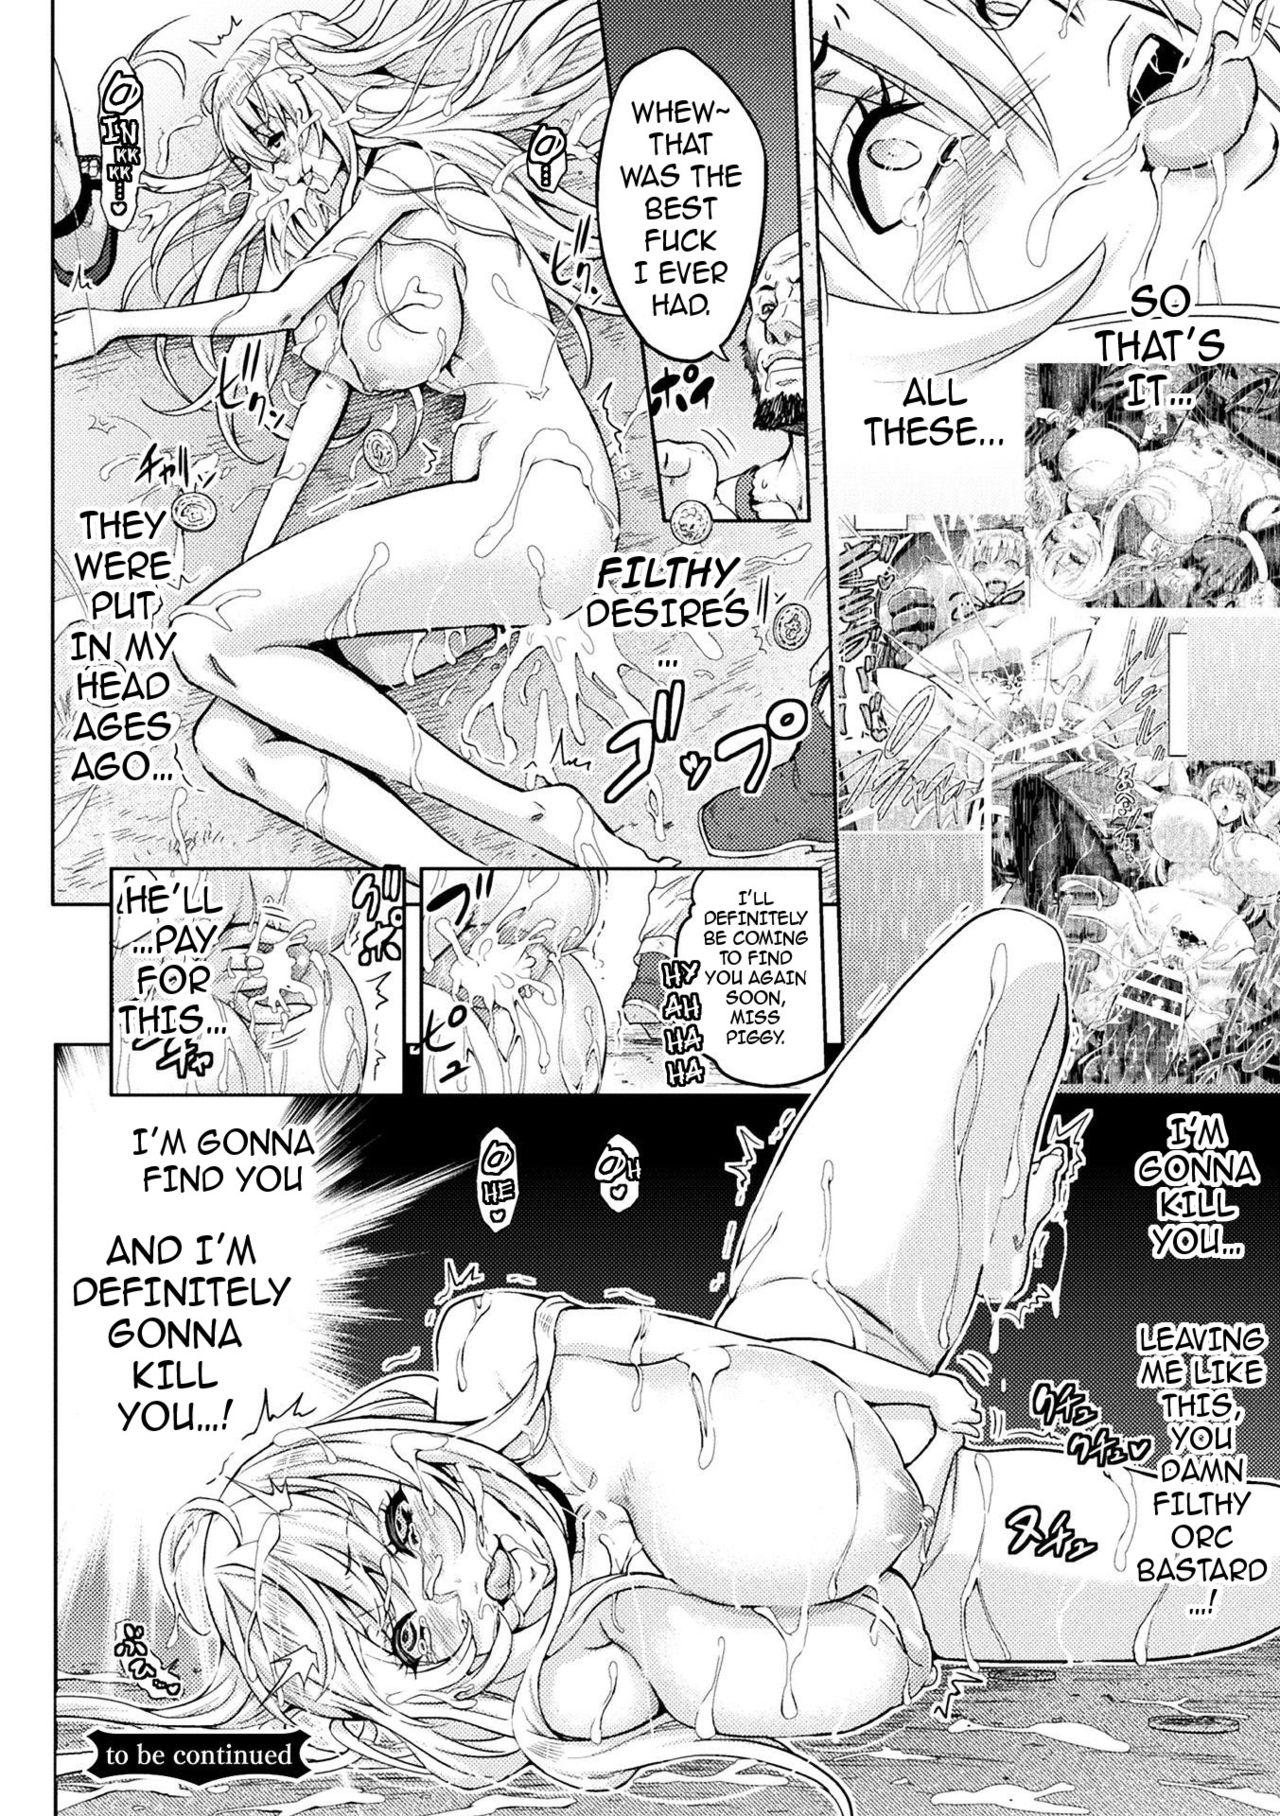 [Yamada Gogogo] Erona ~Orc no Inmon ni Okasareta Onna Kishi no Matsuro~ | Erona ~The Fall of a Beautiful Knight Cursed with the Lewd Mark of an Orc~ [English] {darknight} 152